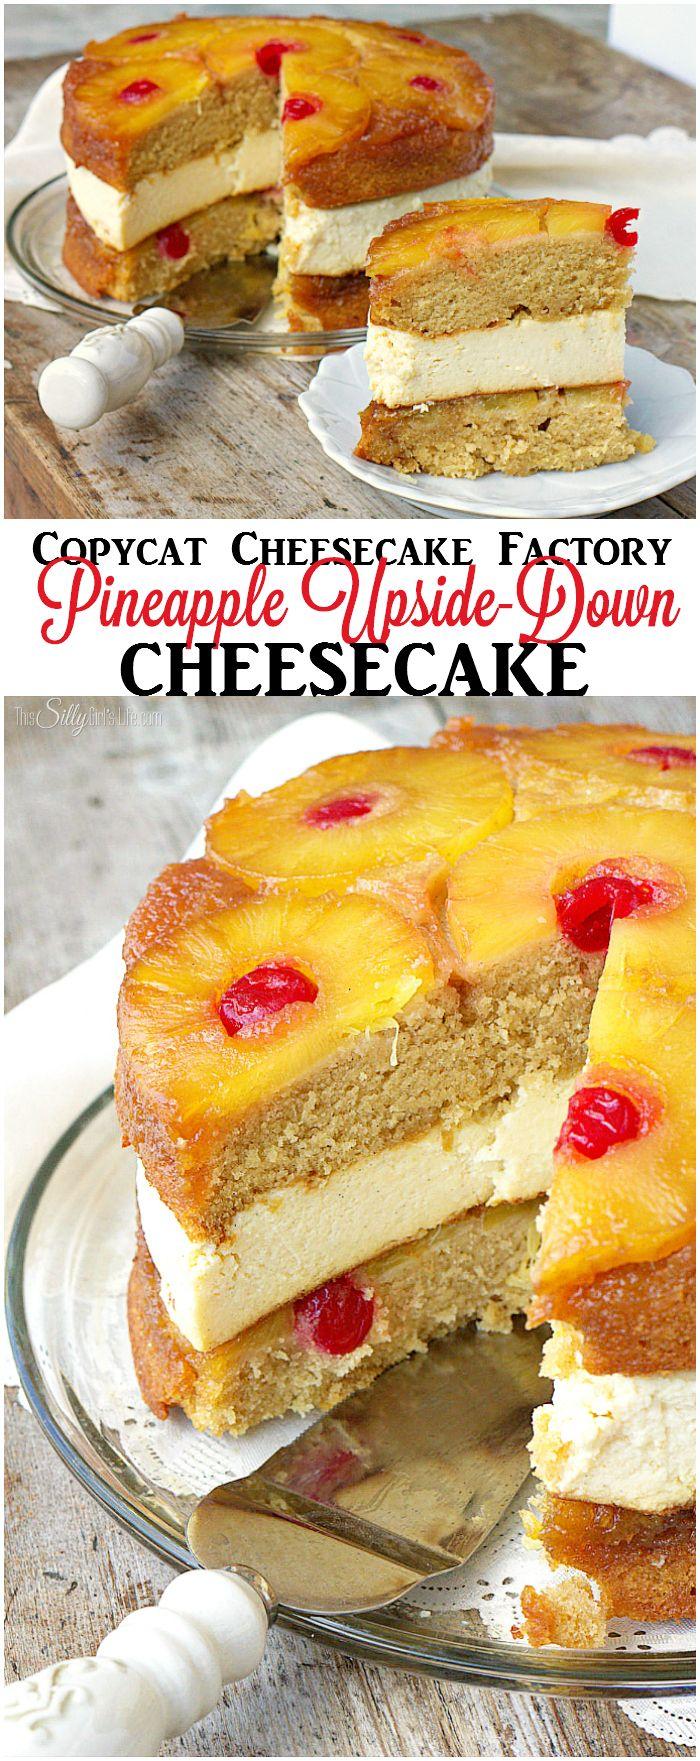 433 Best Pineapple Upside Down Cake Images On Pinterest Apple Pie